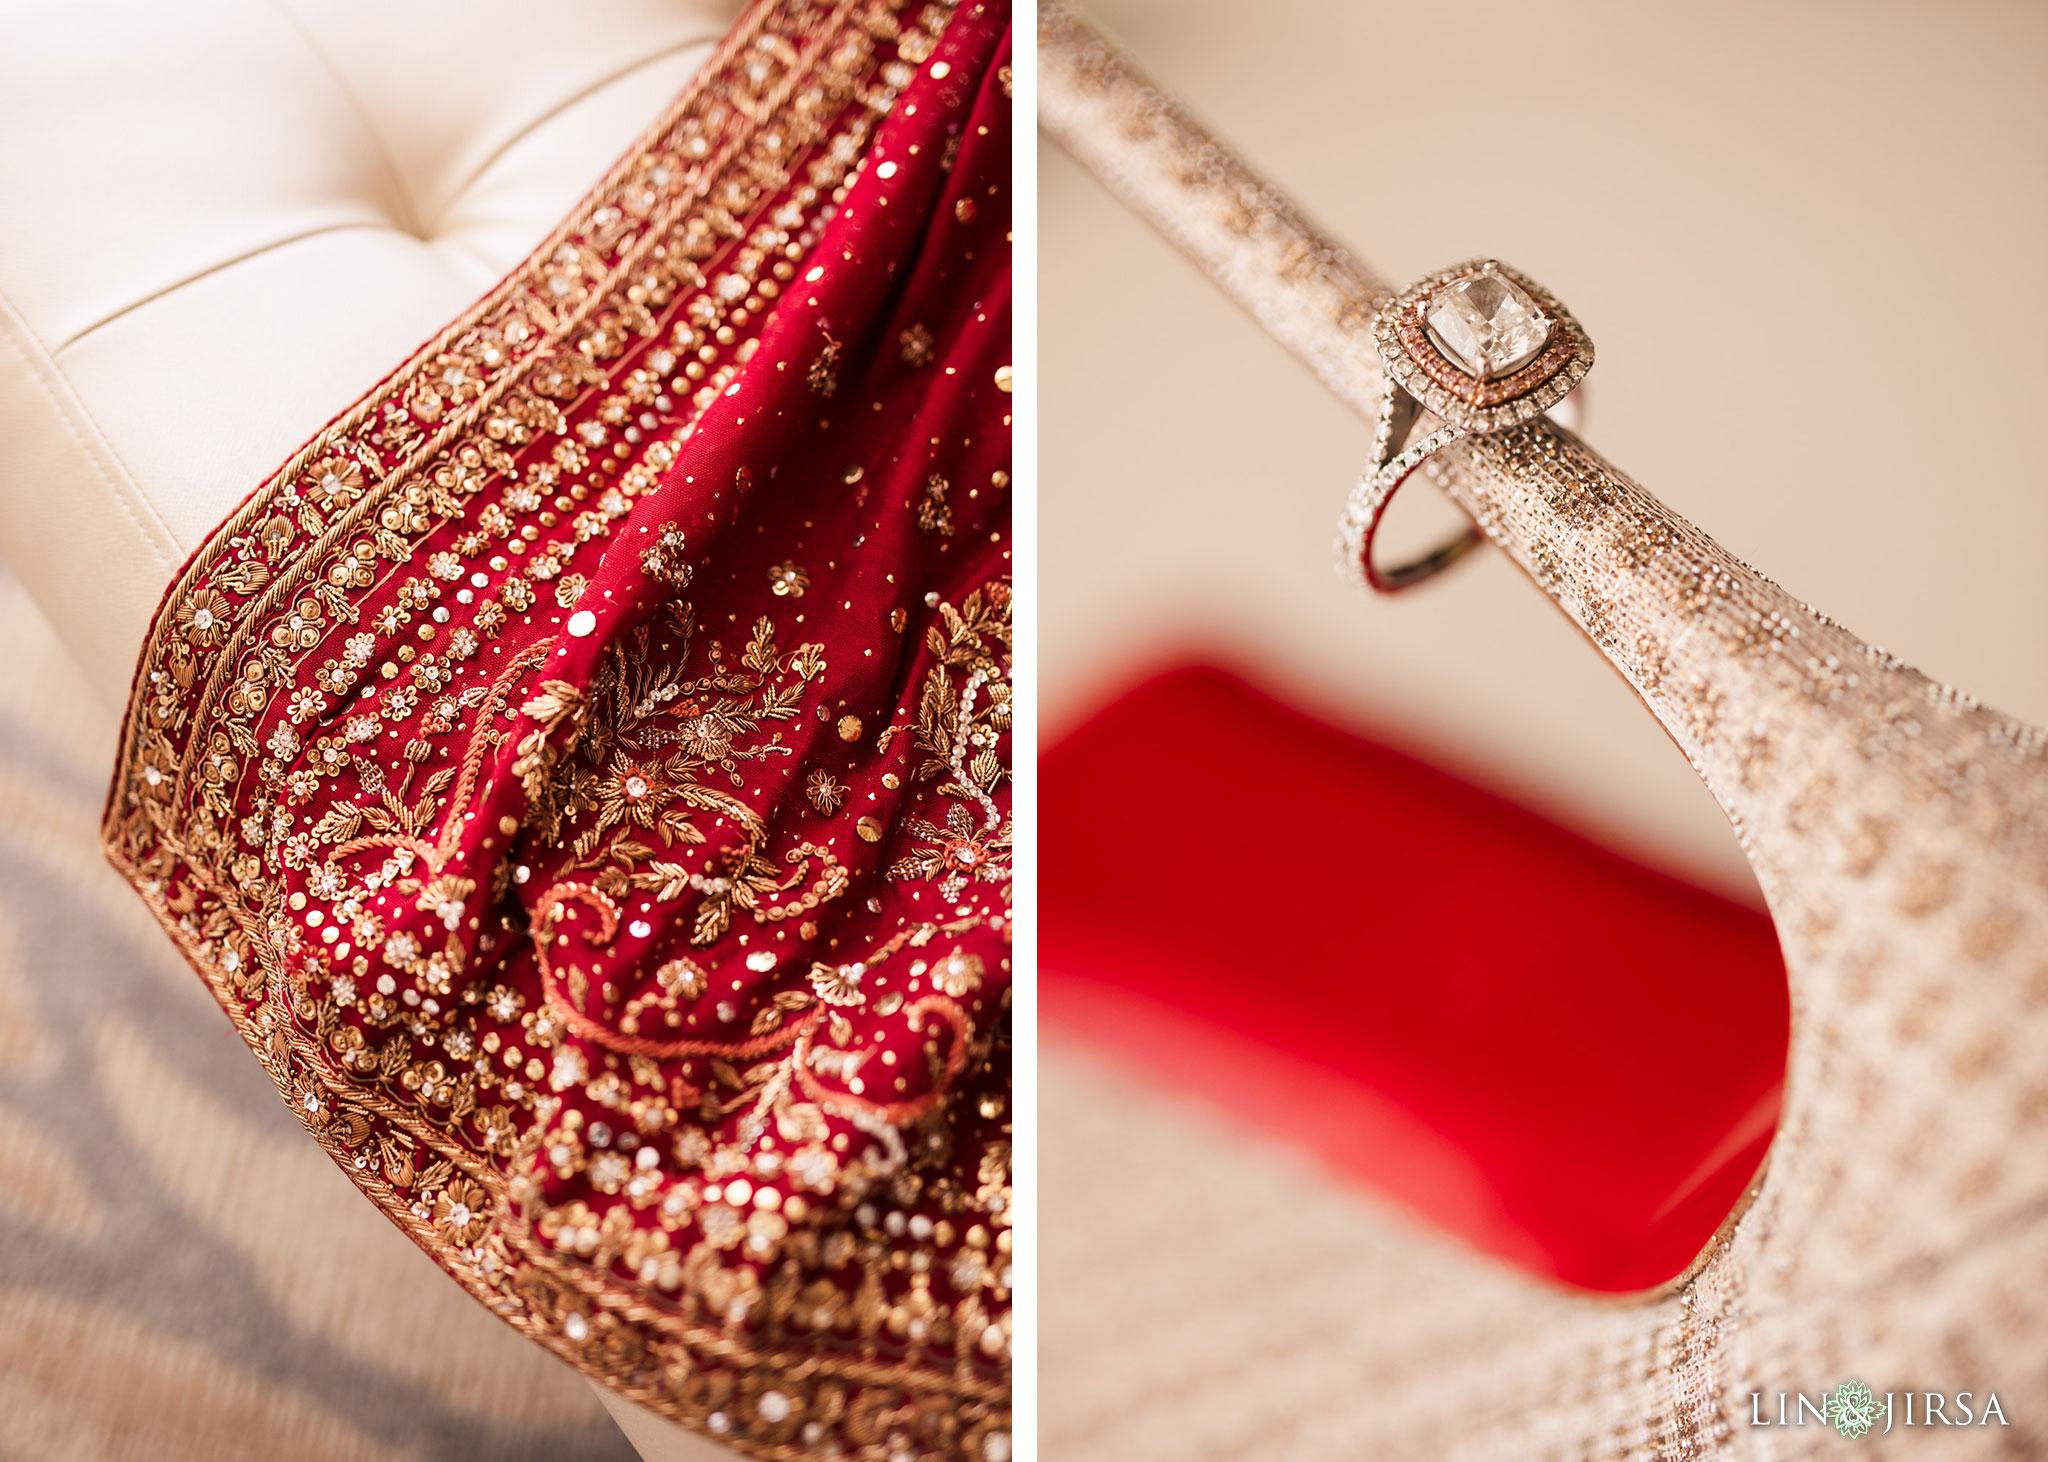 027 pasea hotel huntington beach pakistani muslim wedding photography